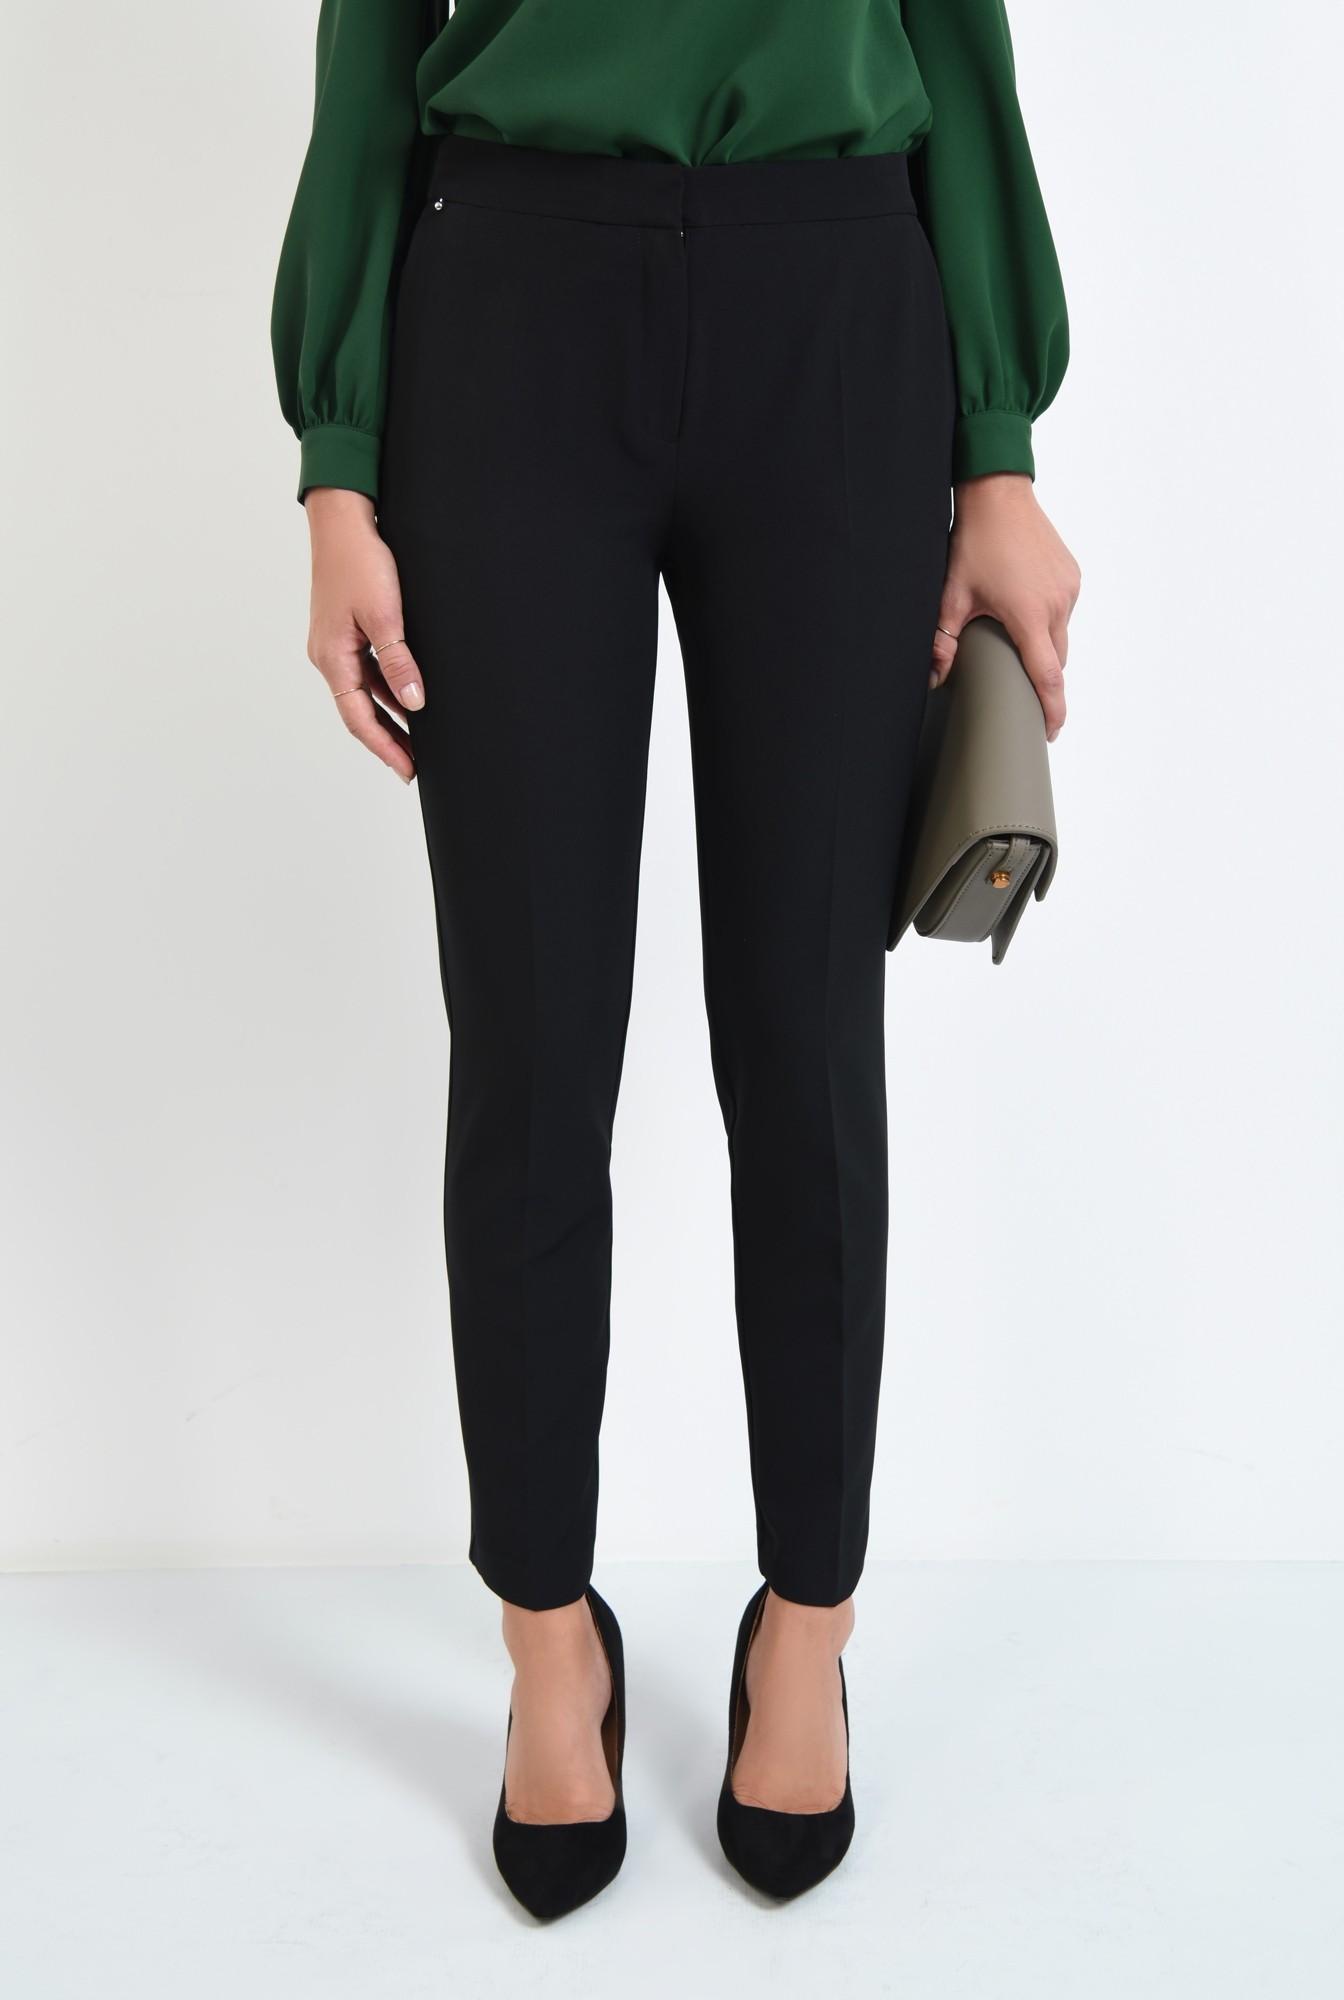 2 - pantaloni casual, negru, talie medie, buzunare